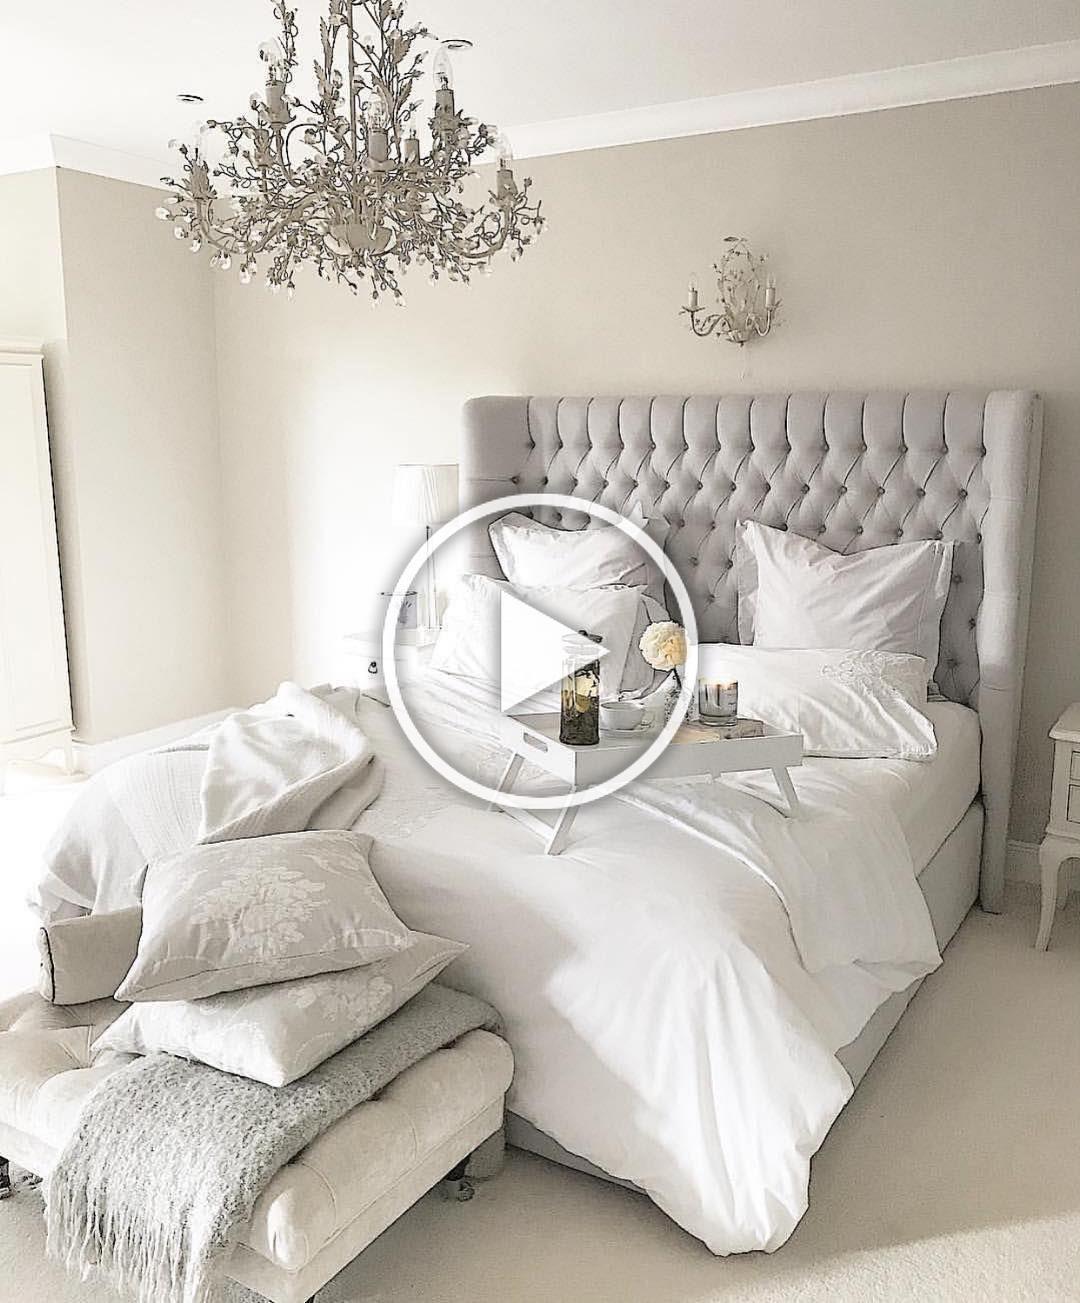 Unbelievable 10 Beegcom Best Furniture Stores Kirti Nagar Top Furniture Brands Malaysia Feltroad In 2020 Room Decor Bedroom Diy Bedroom Decor Interior Design Bedroom